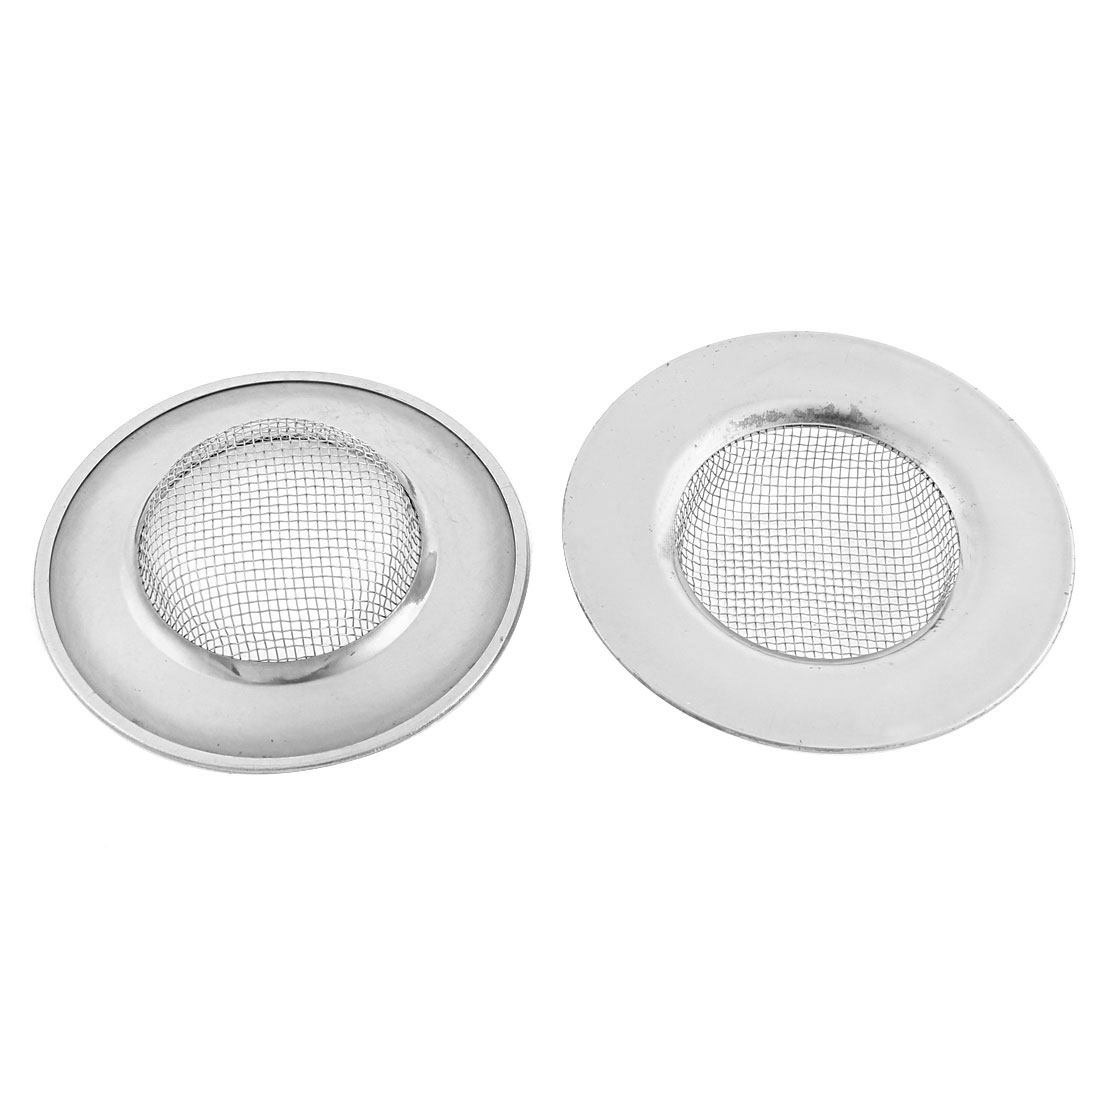 Kitchen Stainless Steel Sink Basin Waste Strainer Filter Drainer Stopper 2pcs